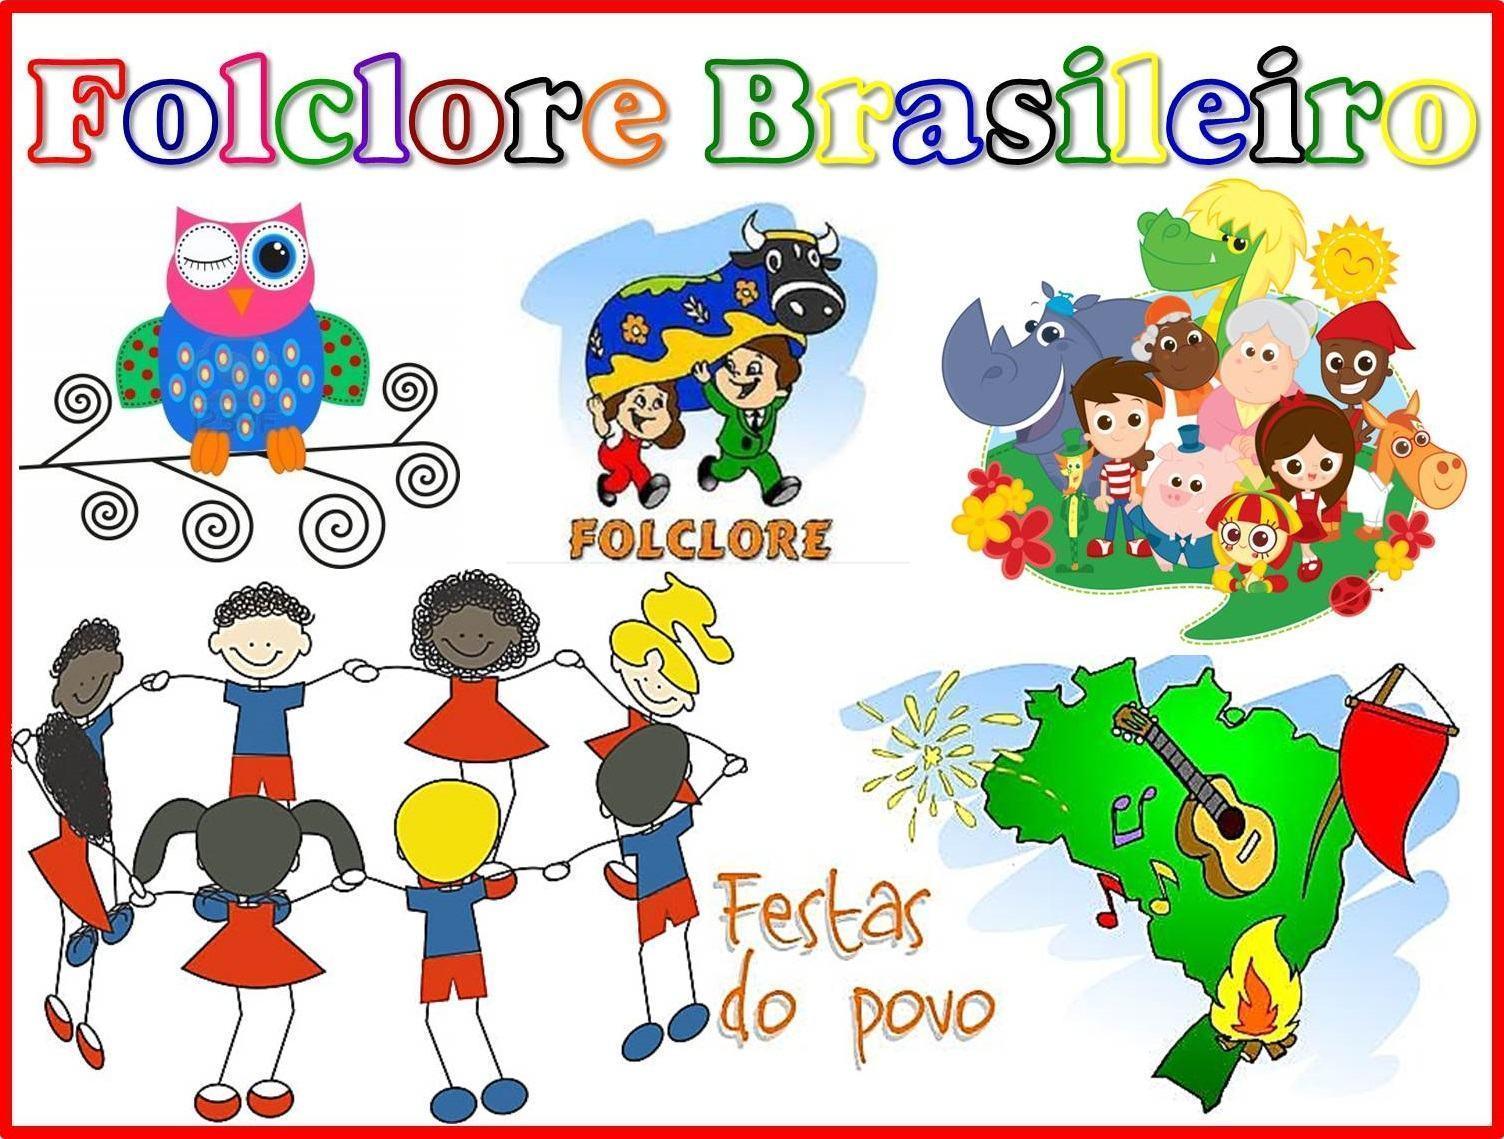 Folclore brasileiro - Lendas 5decf93f85b